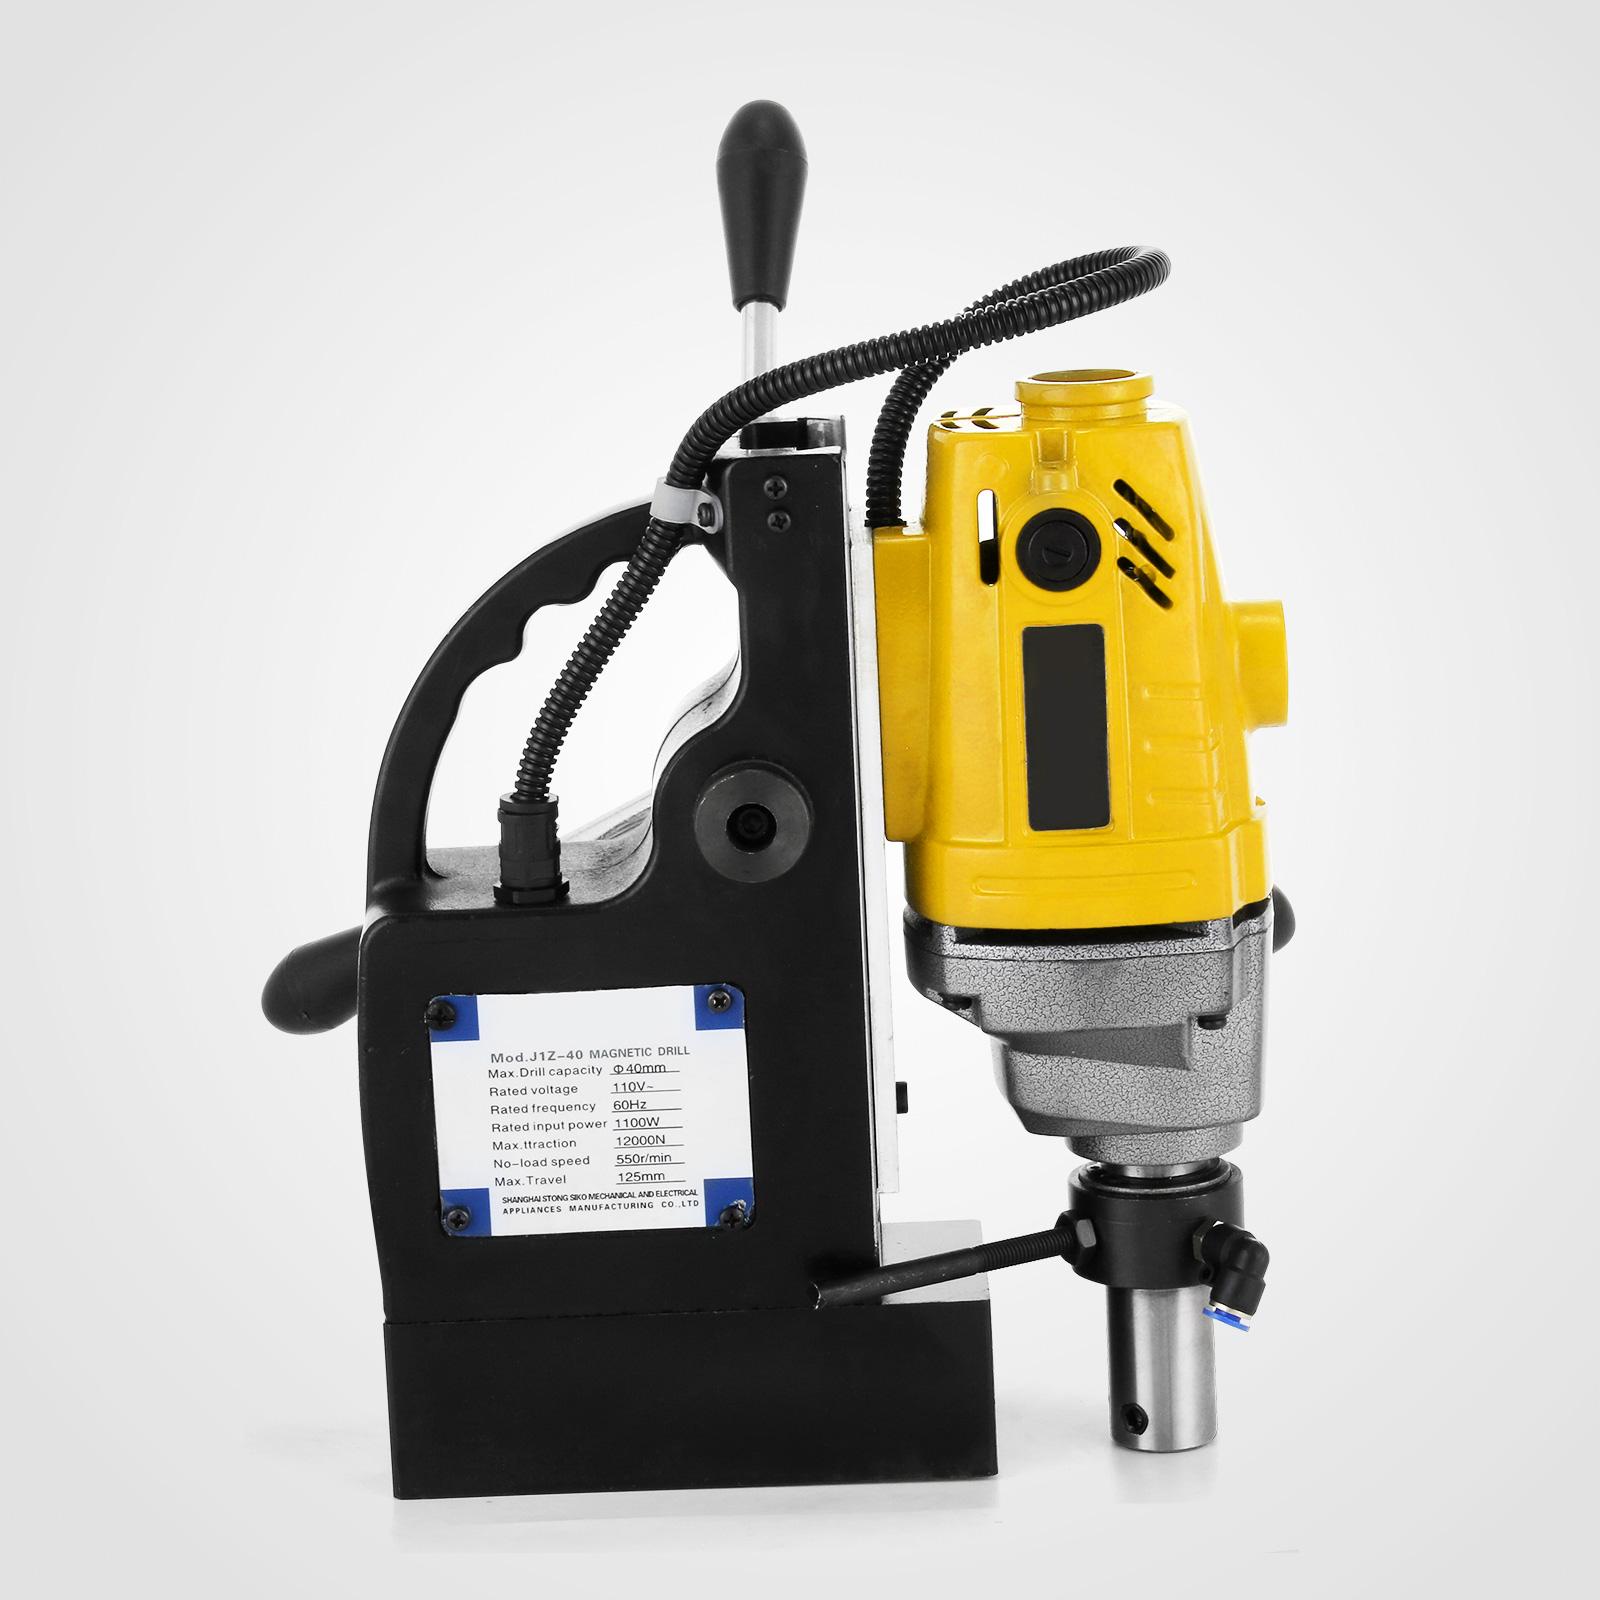 MB23-BRM35-MD40-Trapano-Perforatrice-Carotatore-Fresa-Magnetico-12-40mm-230V miniatura 18